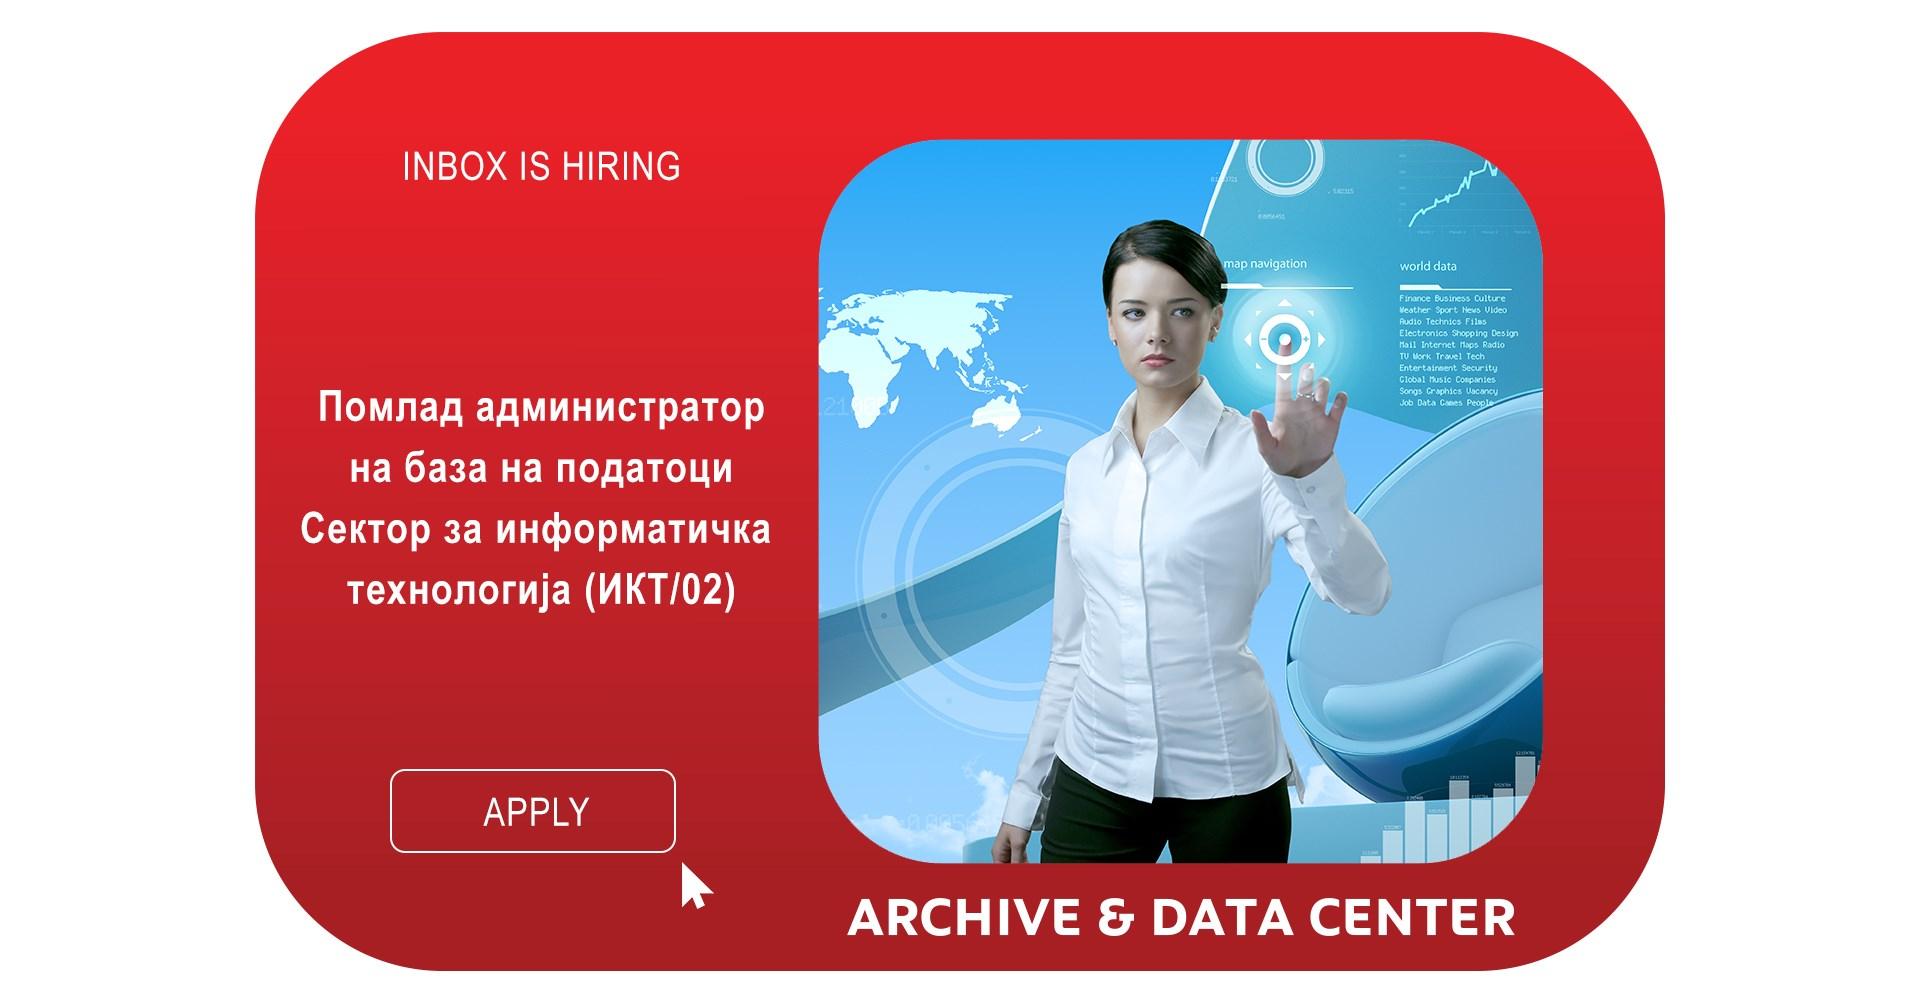 Помлад администратор на база на податоци